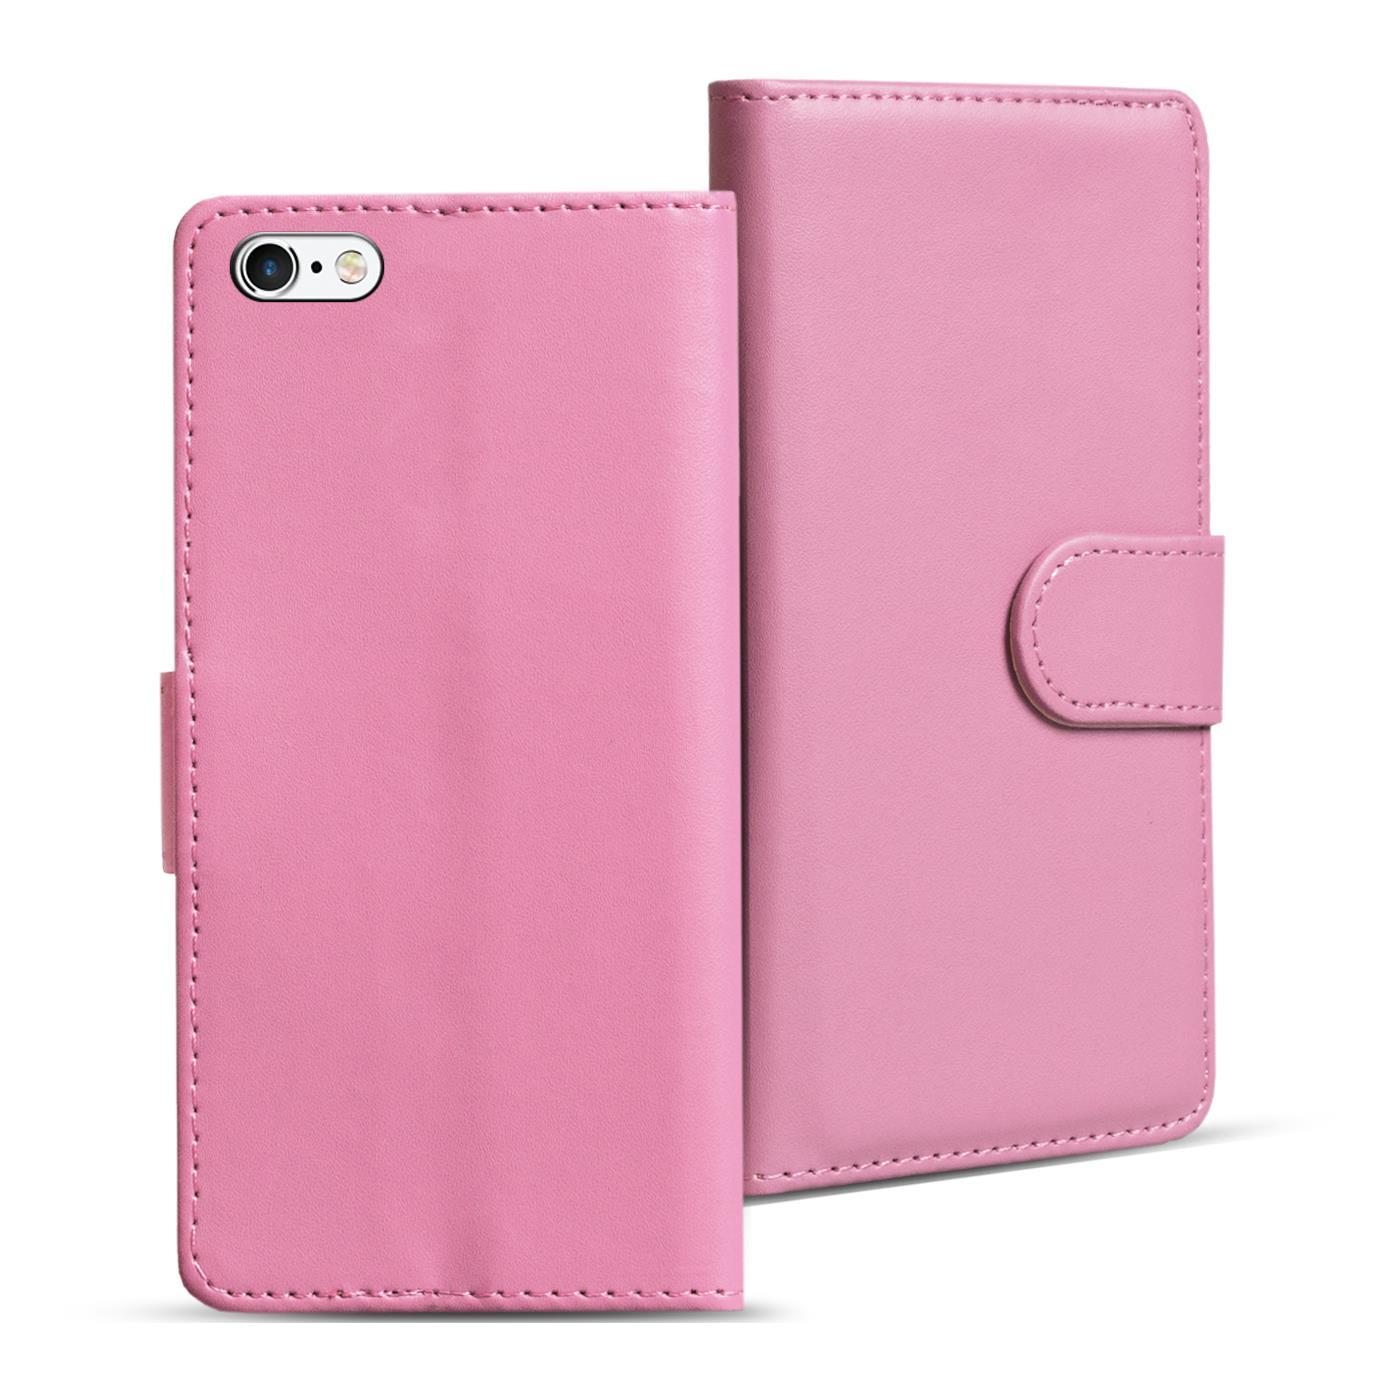 Funda-para-Movil-Apple-Iphone-Estuche-Basic-Wallet-Plegable